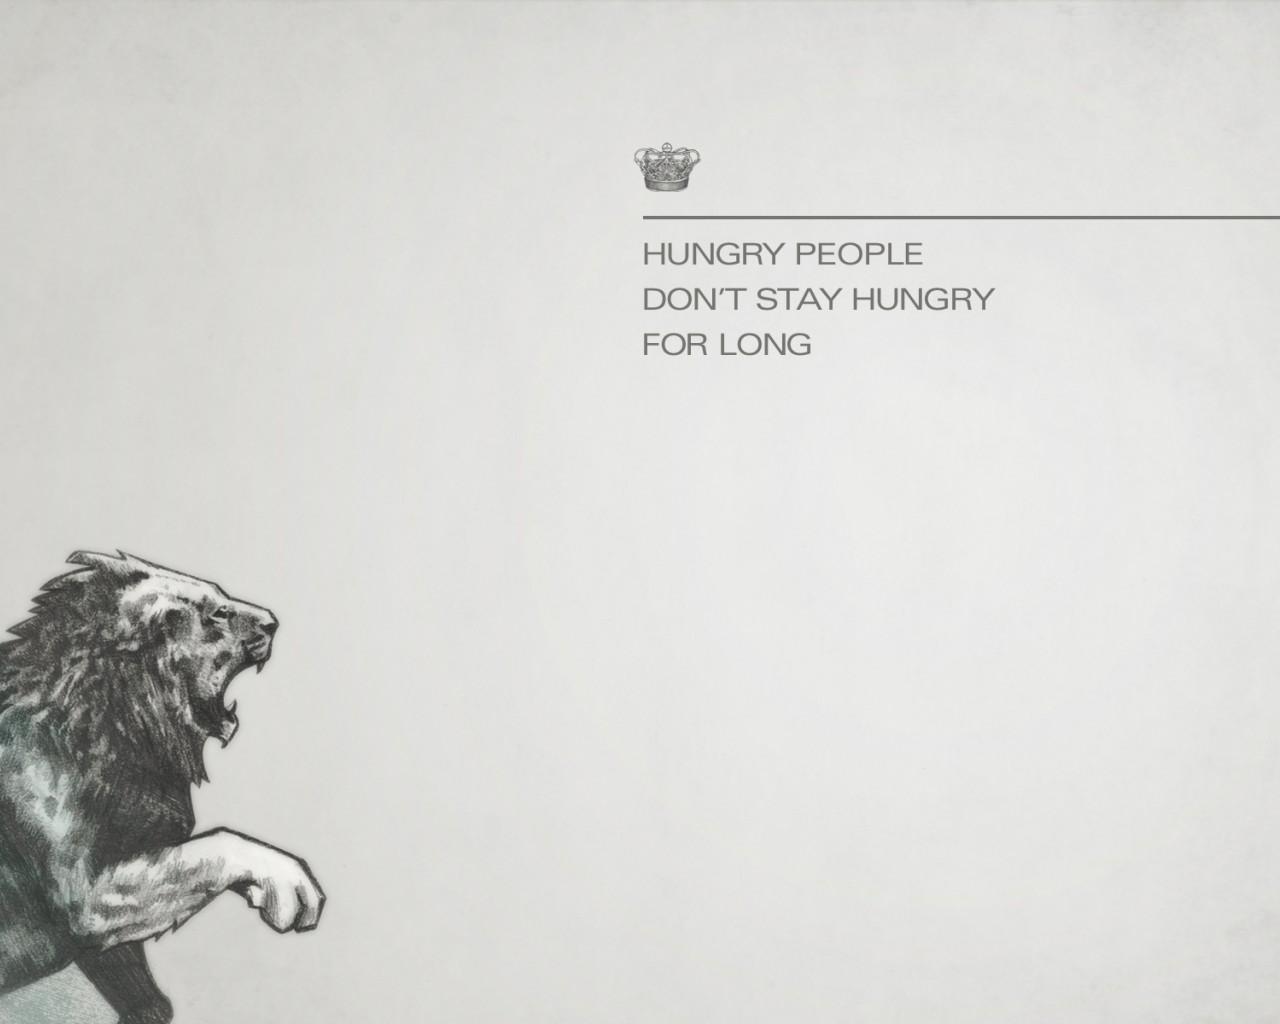 Lion Quote 名言 格言 壁紙 31675689 ファンポップ